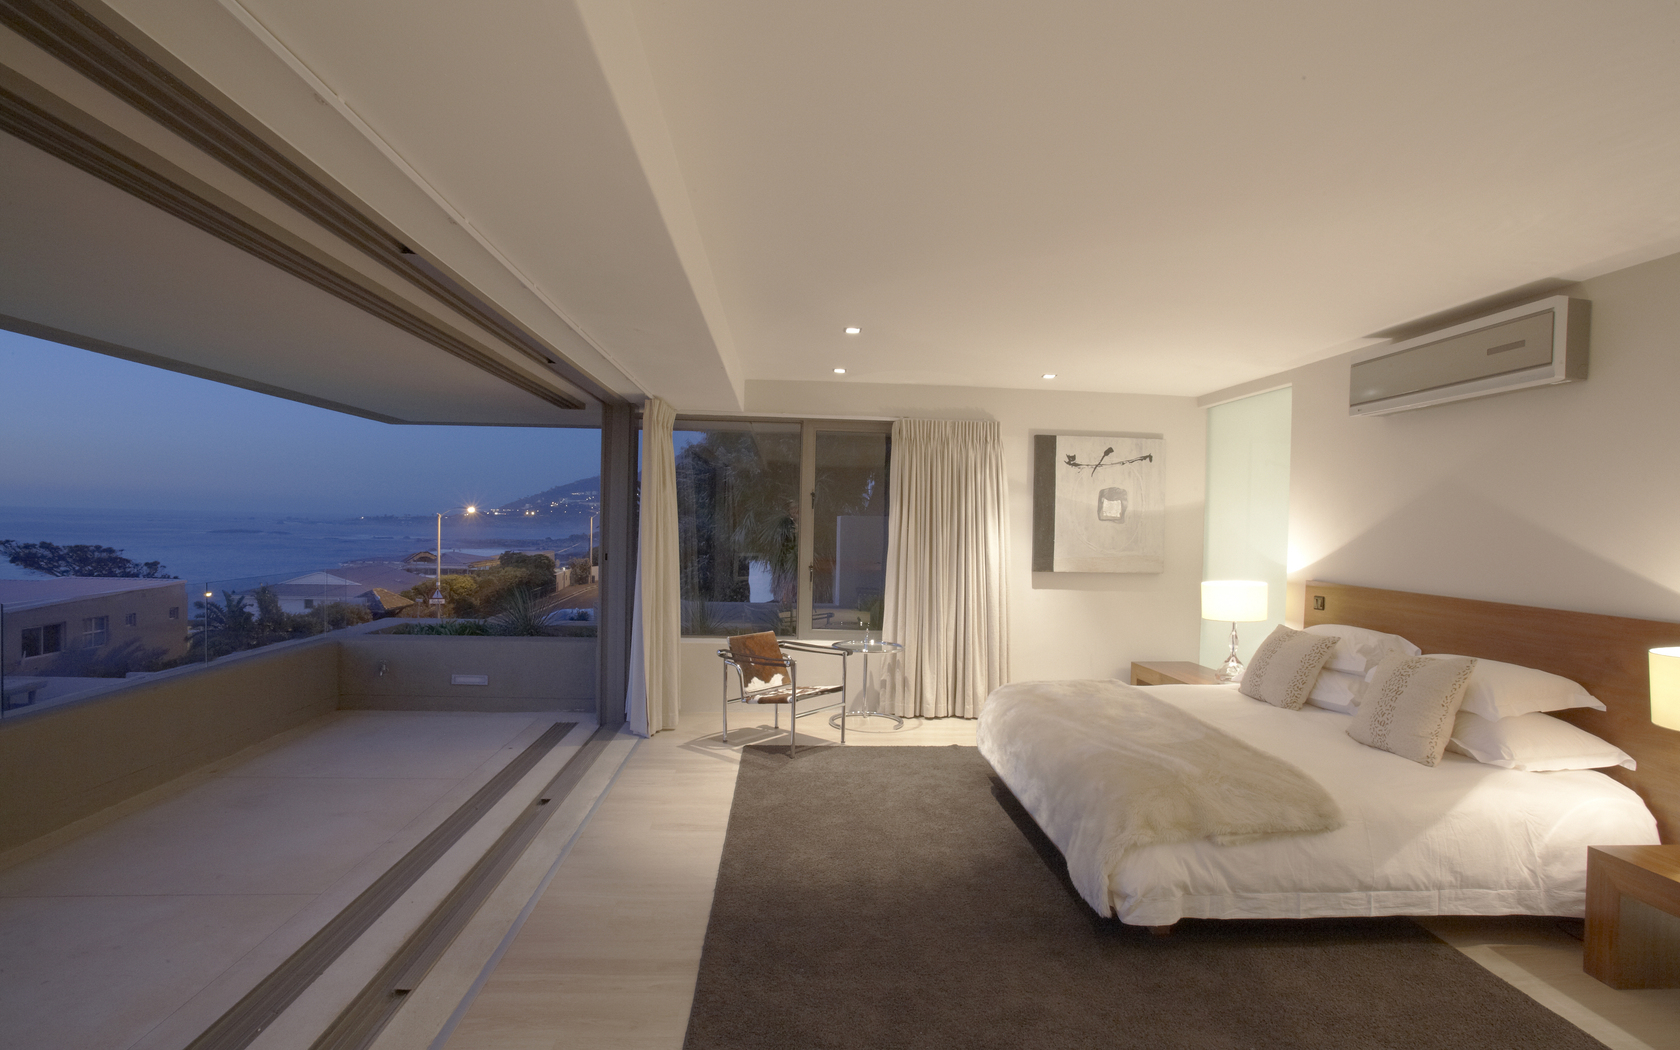 Bedroom with sea view houseidea for Outdoor bedroom